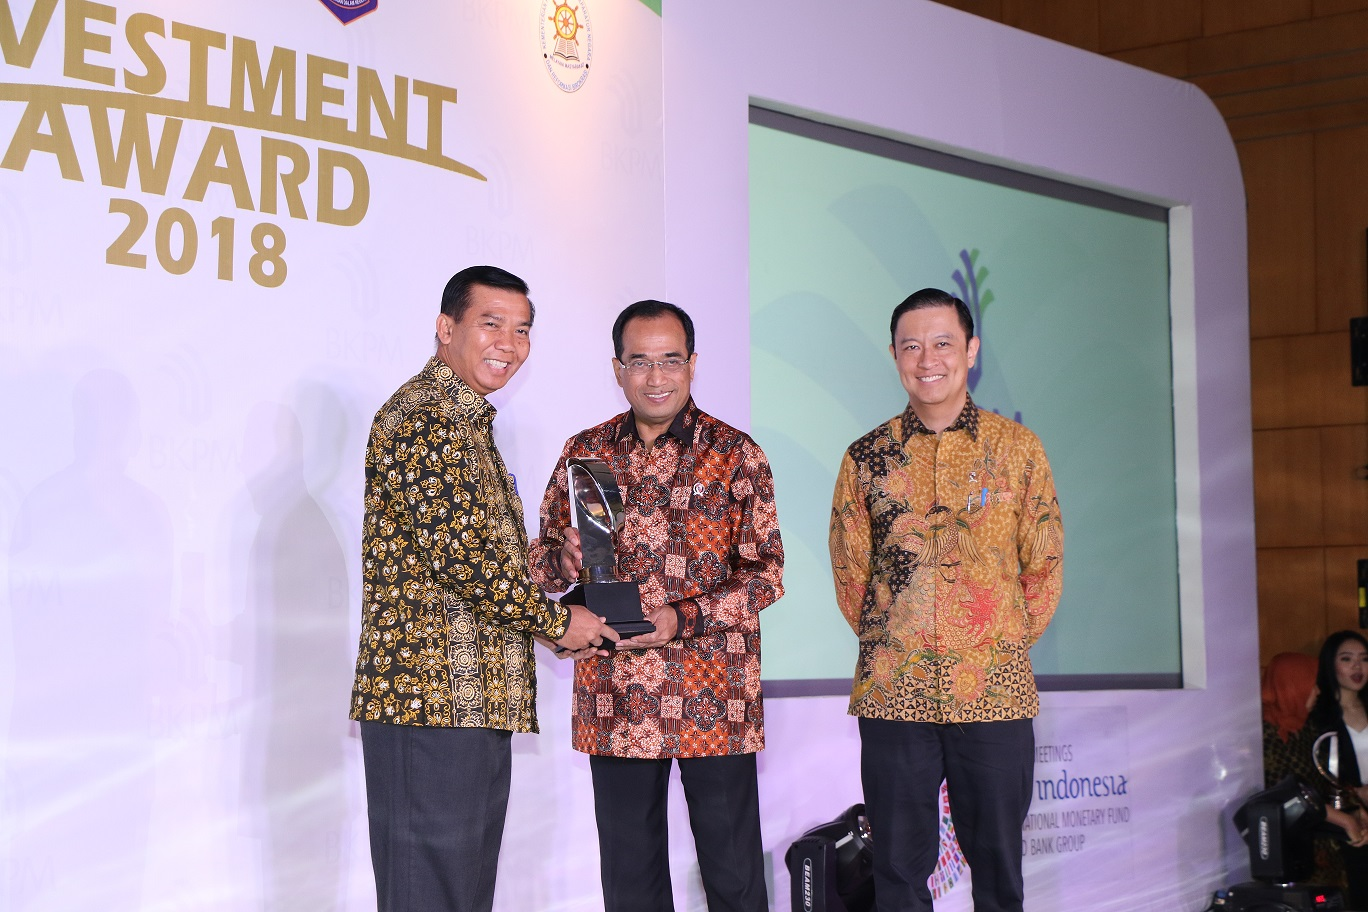 Investment Award 2018